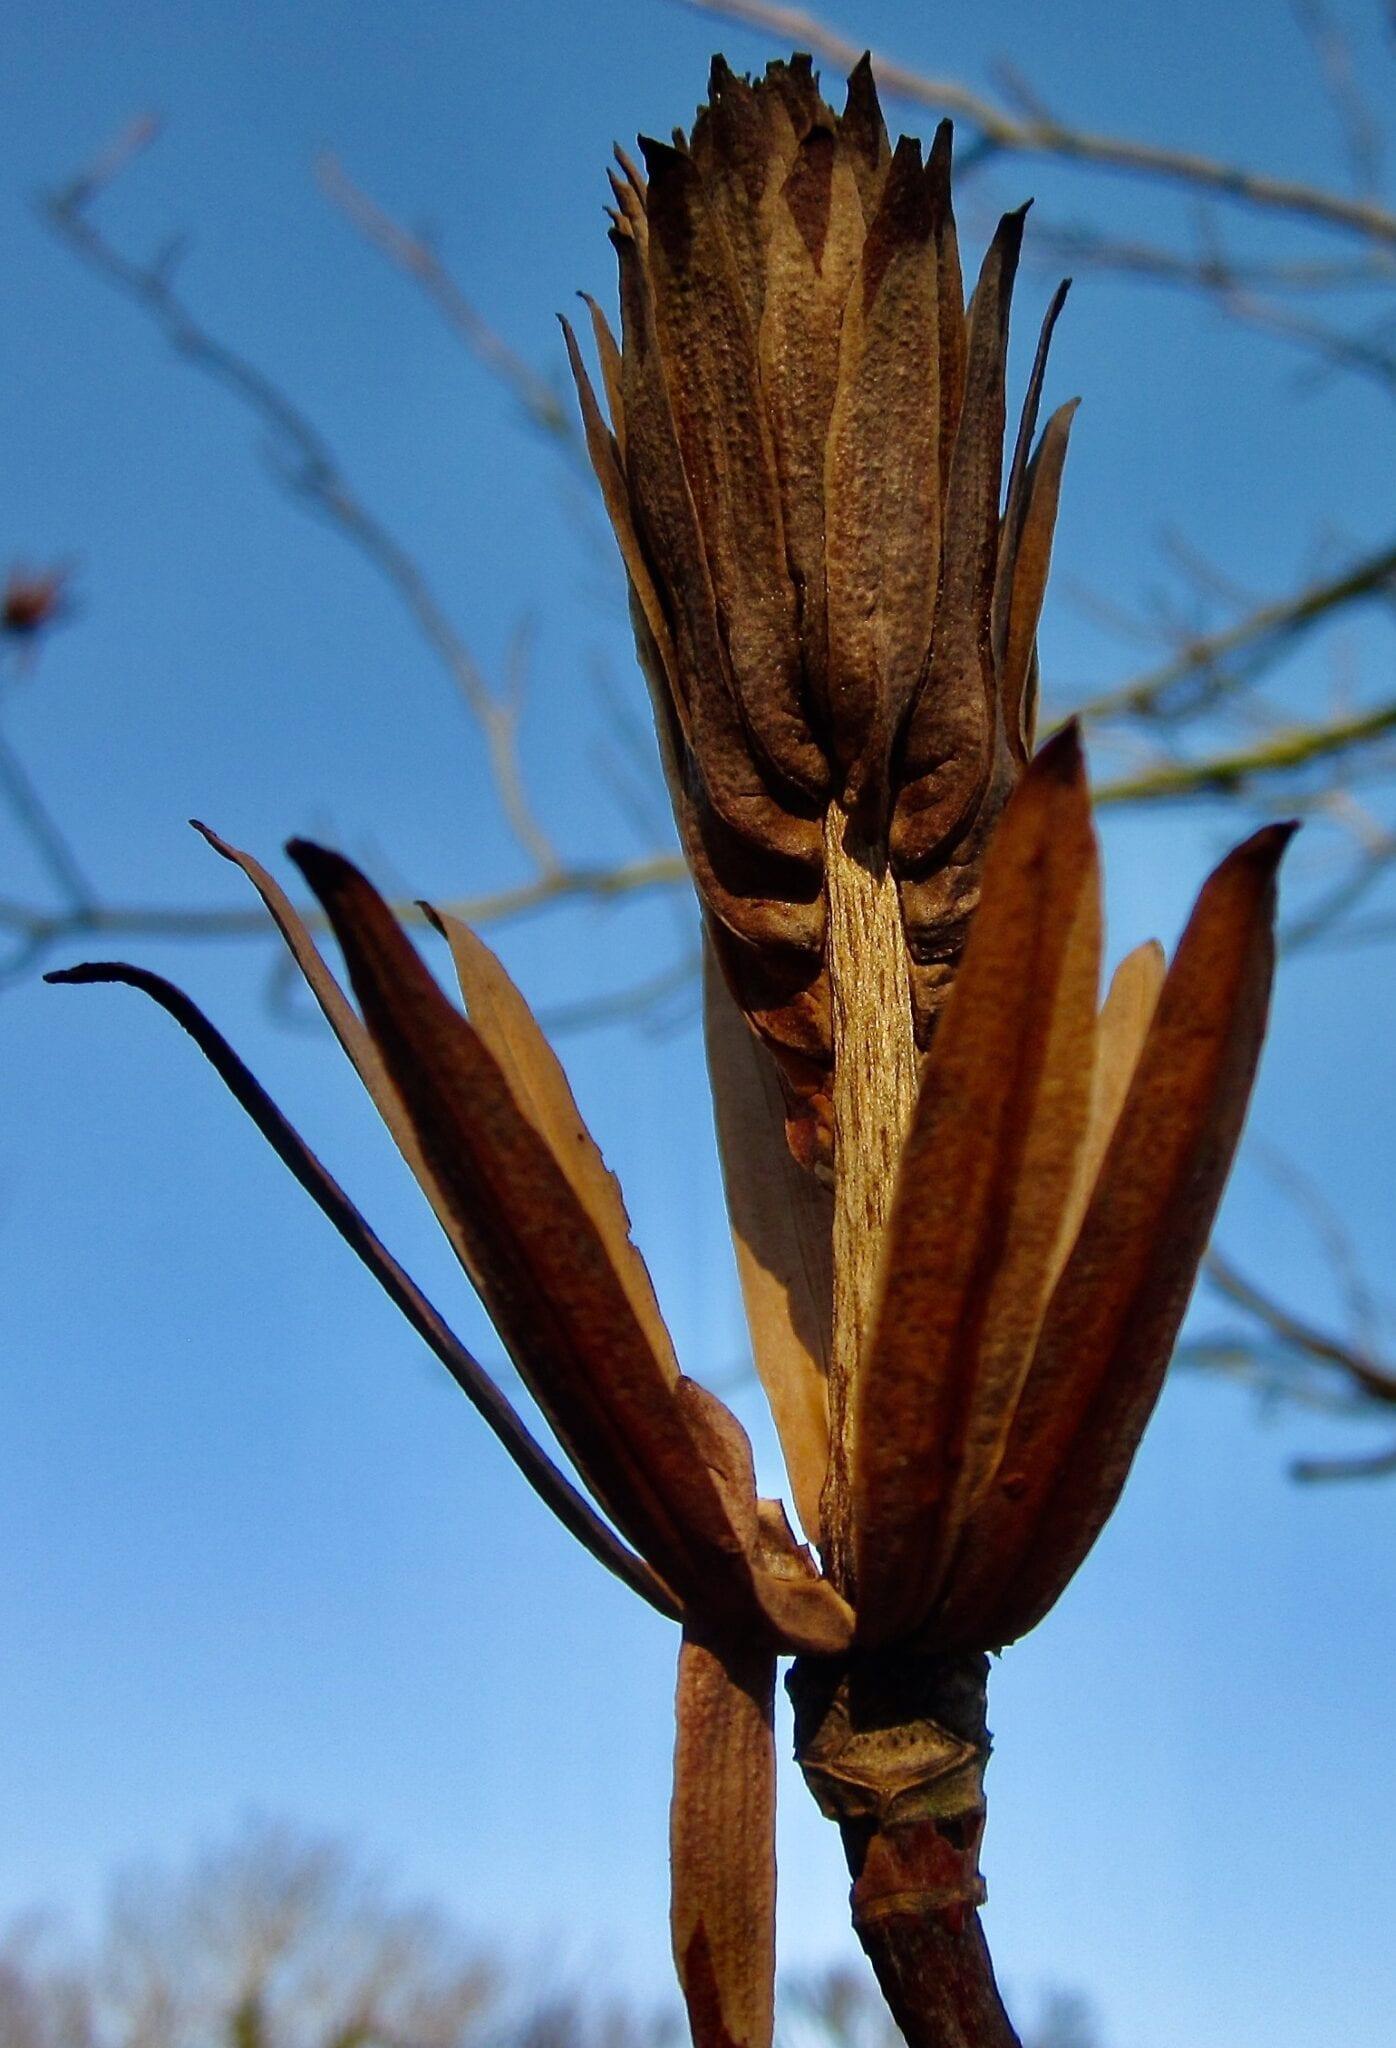 Tulip Tree fruit in winter